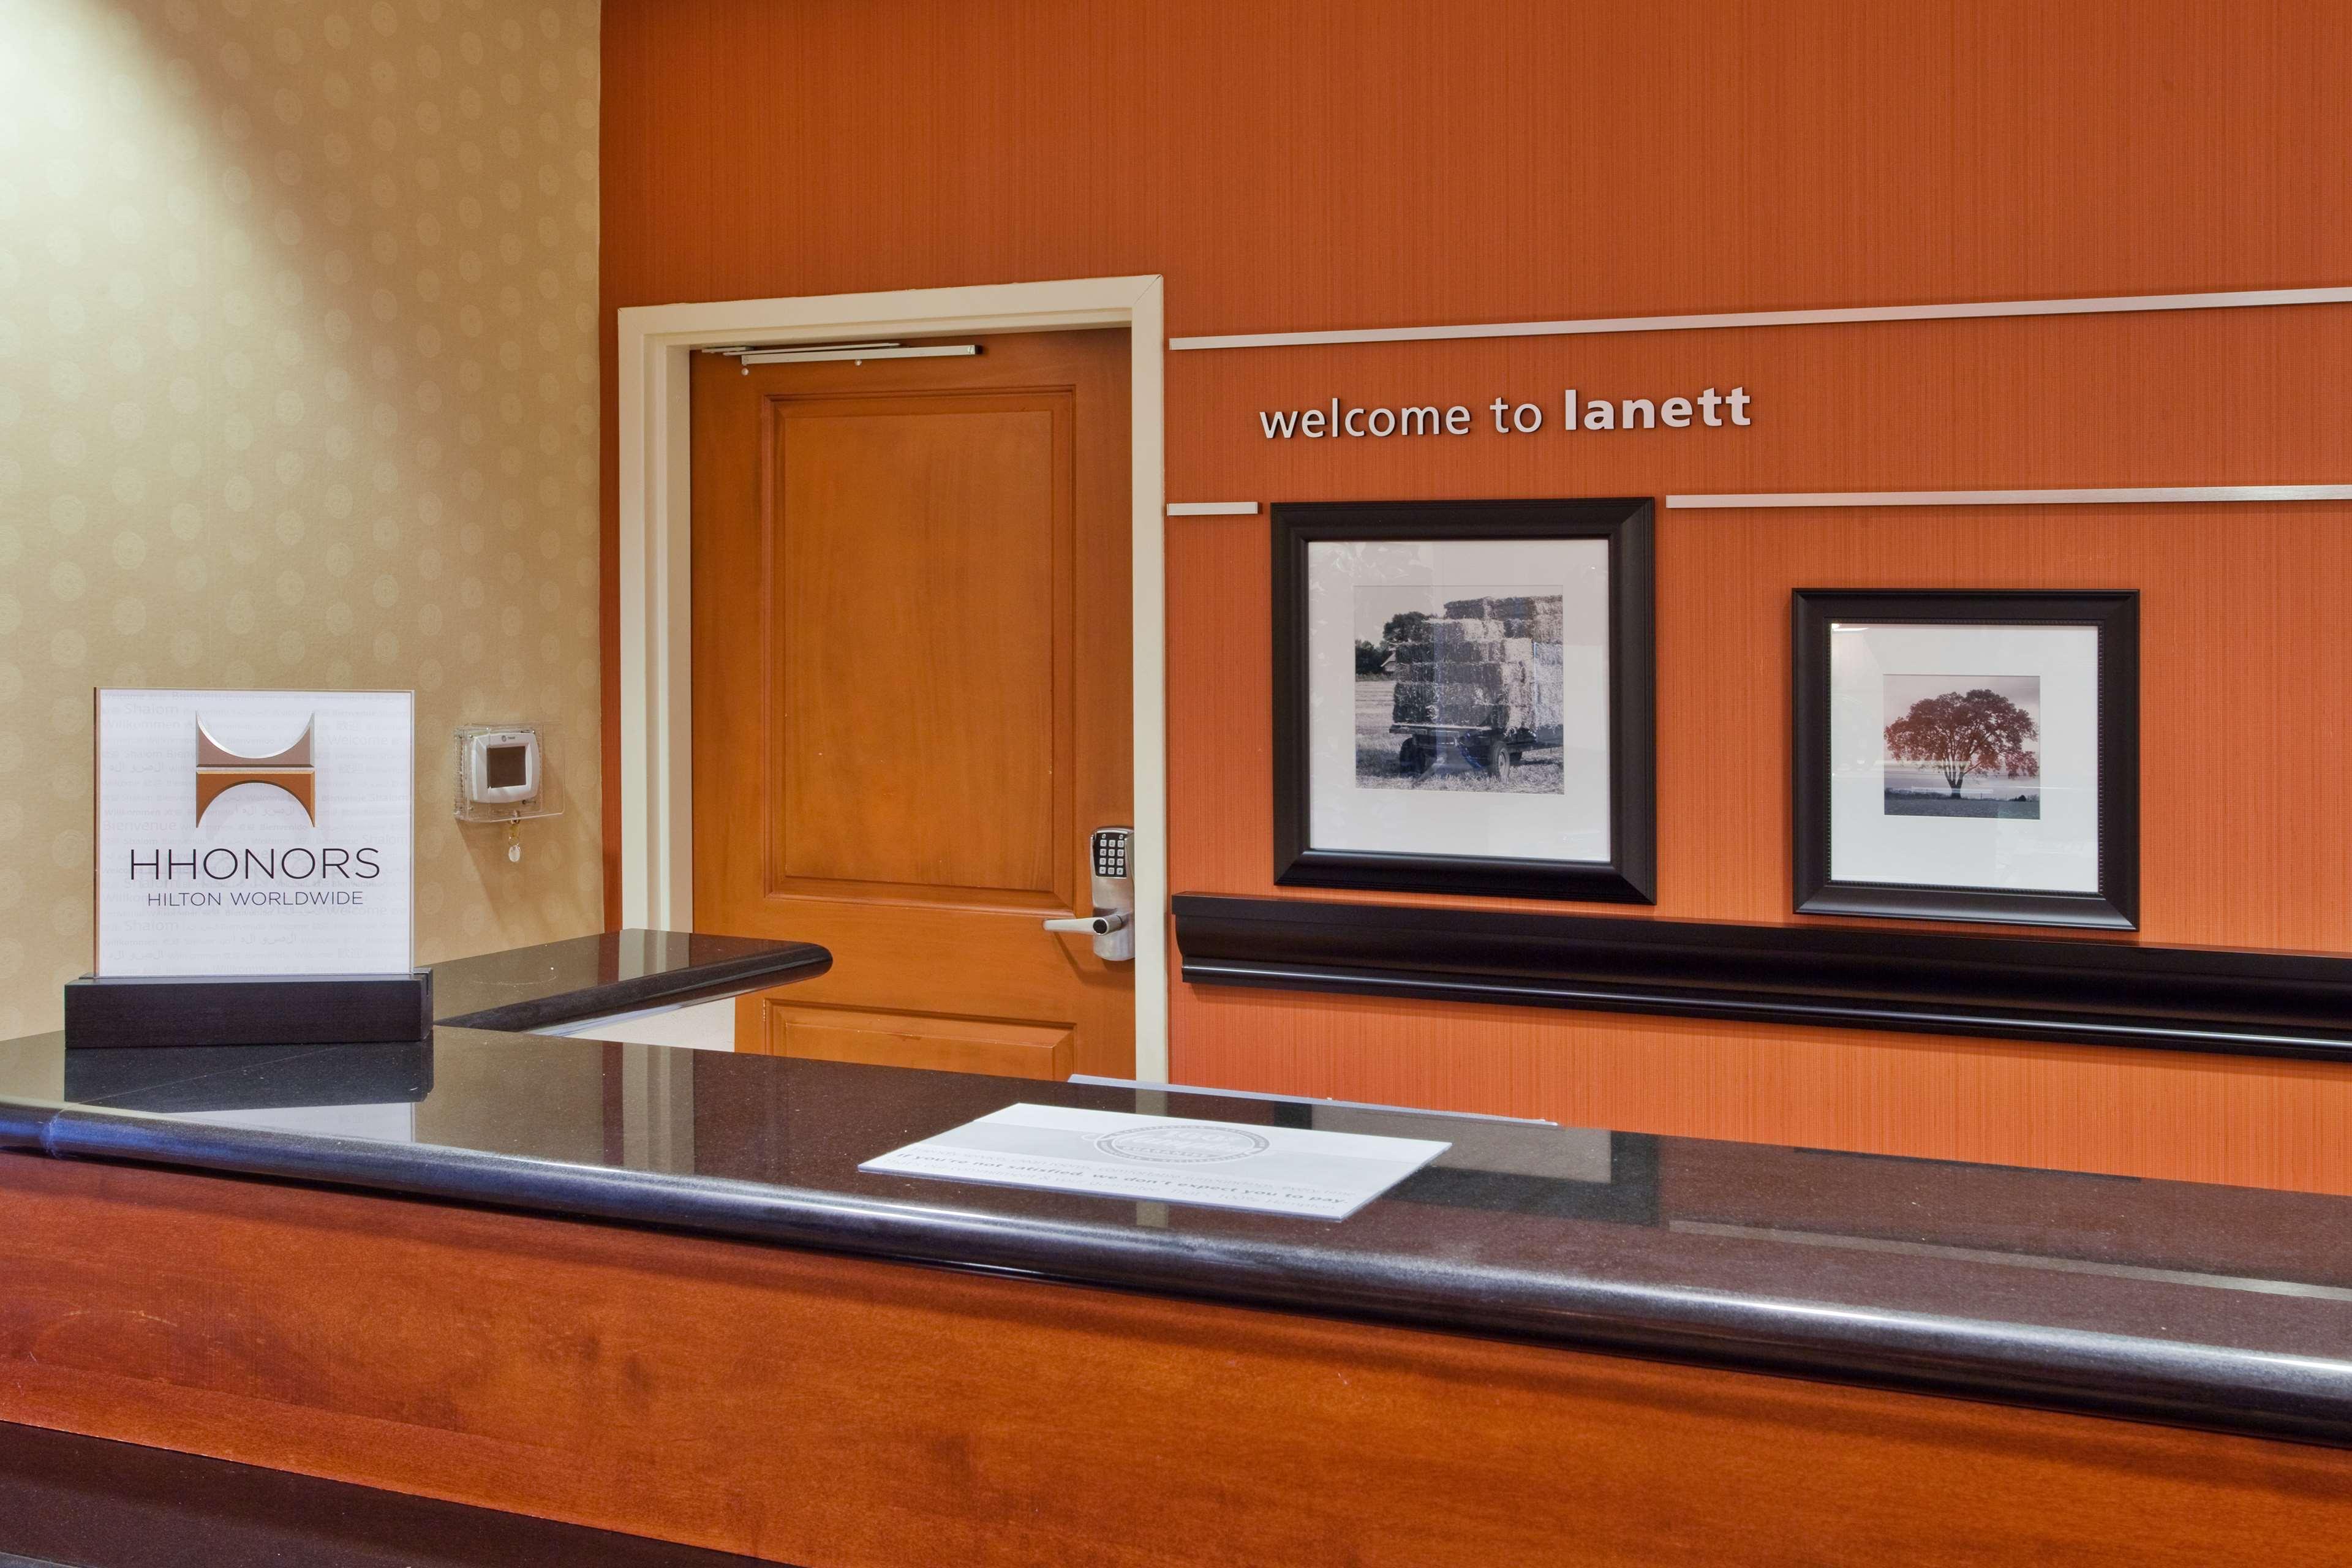 Hampton Inn & Suites Lanett-West Point image 10